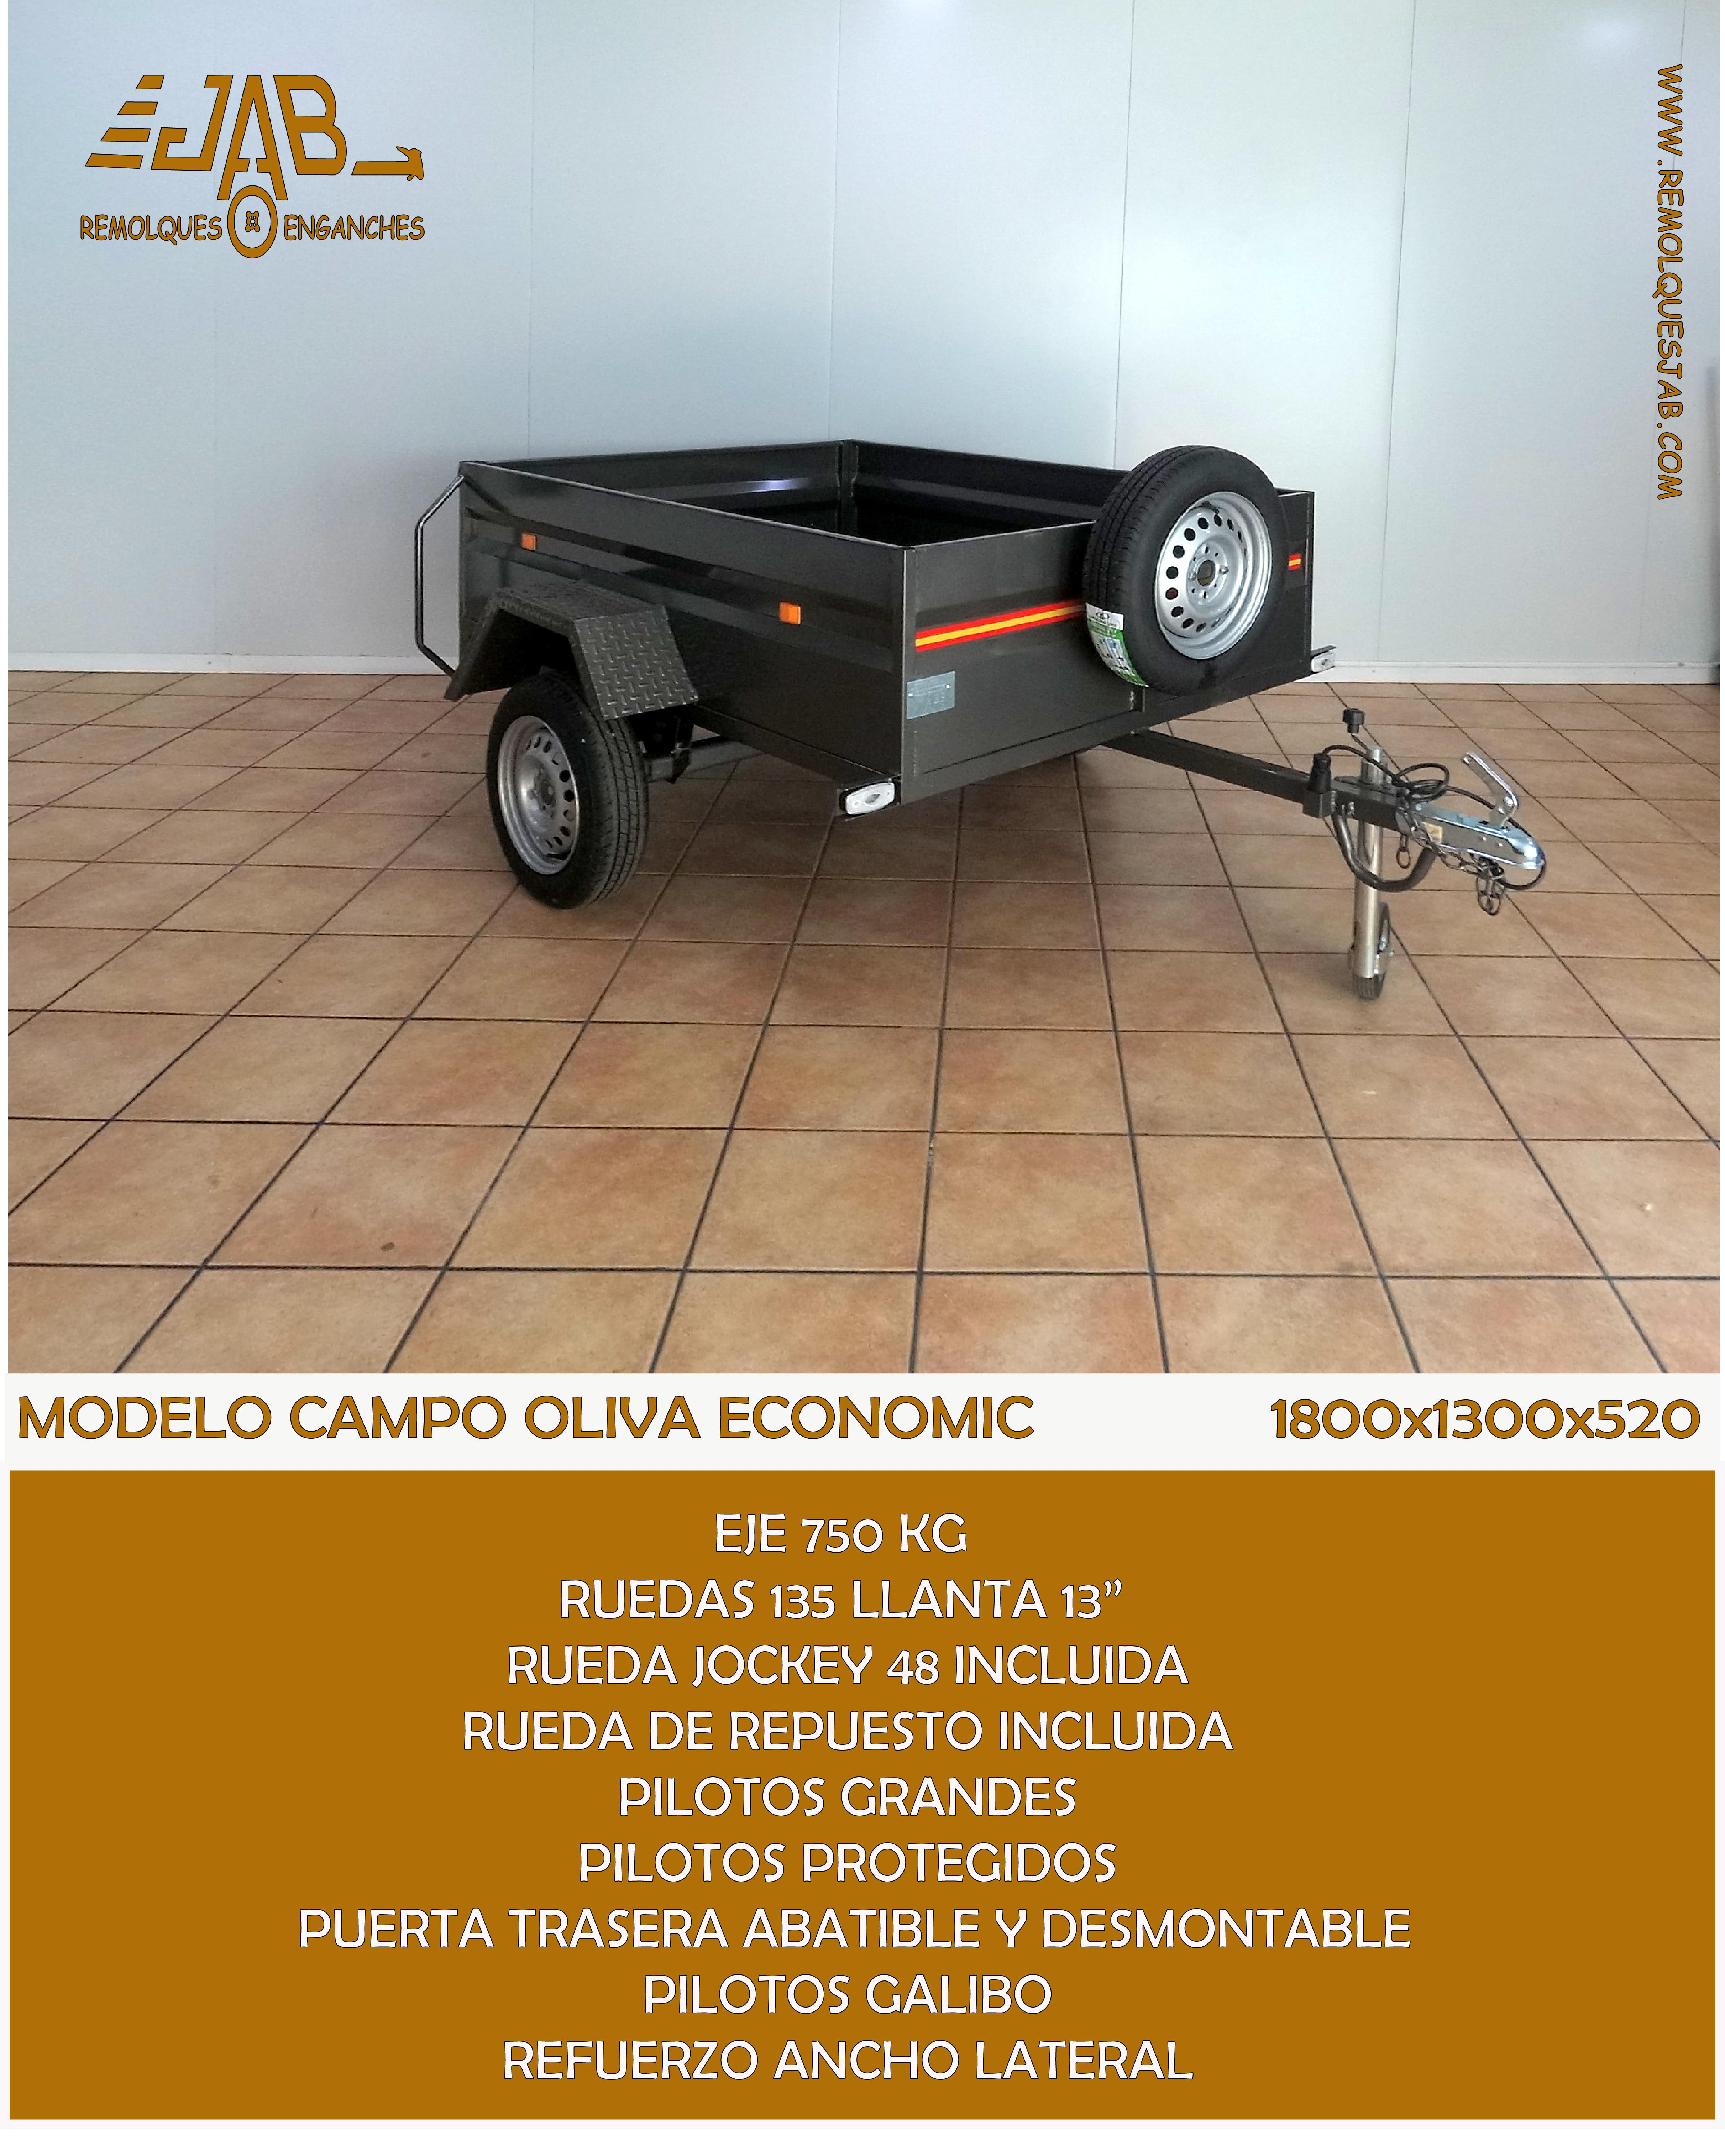 MODELO CAMPO OLIVA ECONOMIC WEB